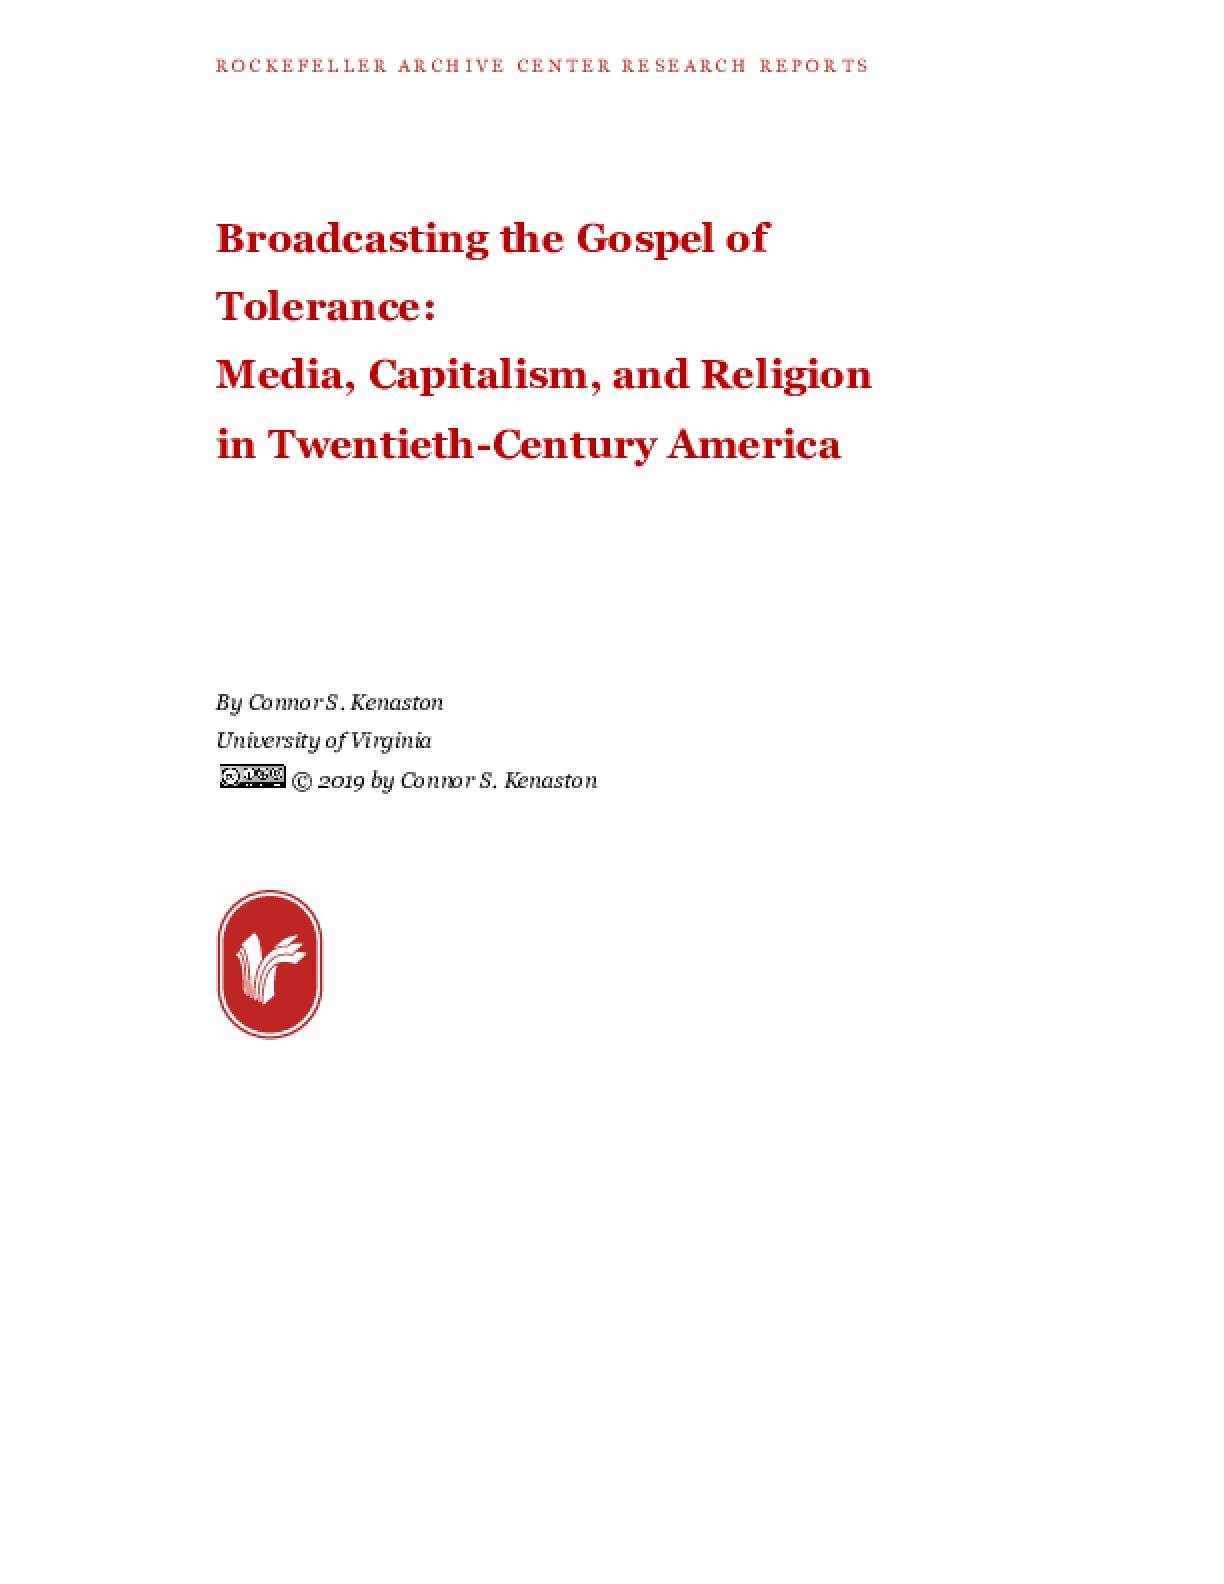 Broadcasting the Gospel of Tolerance: Media, Capitalism, and Religion in Twentieth-Century America